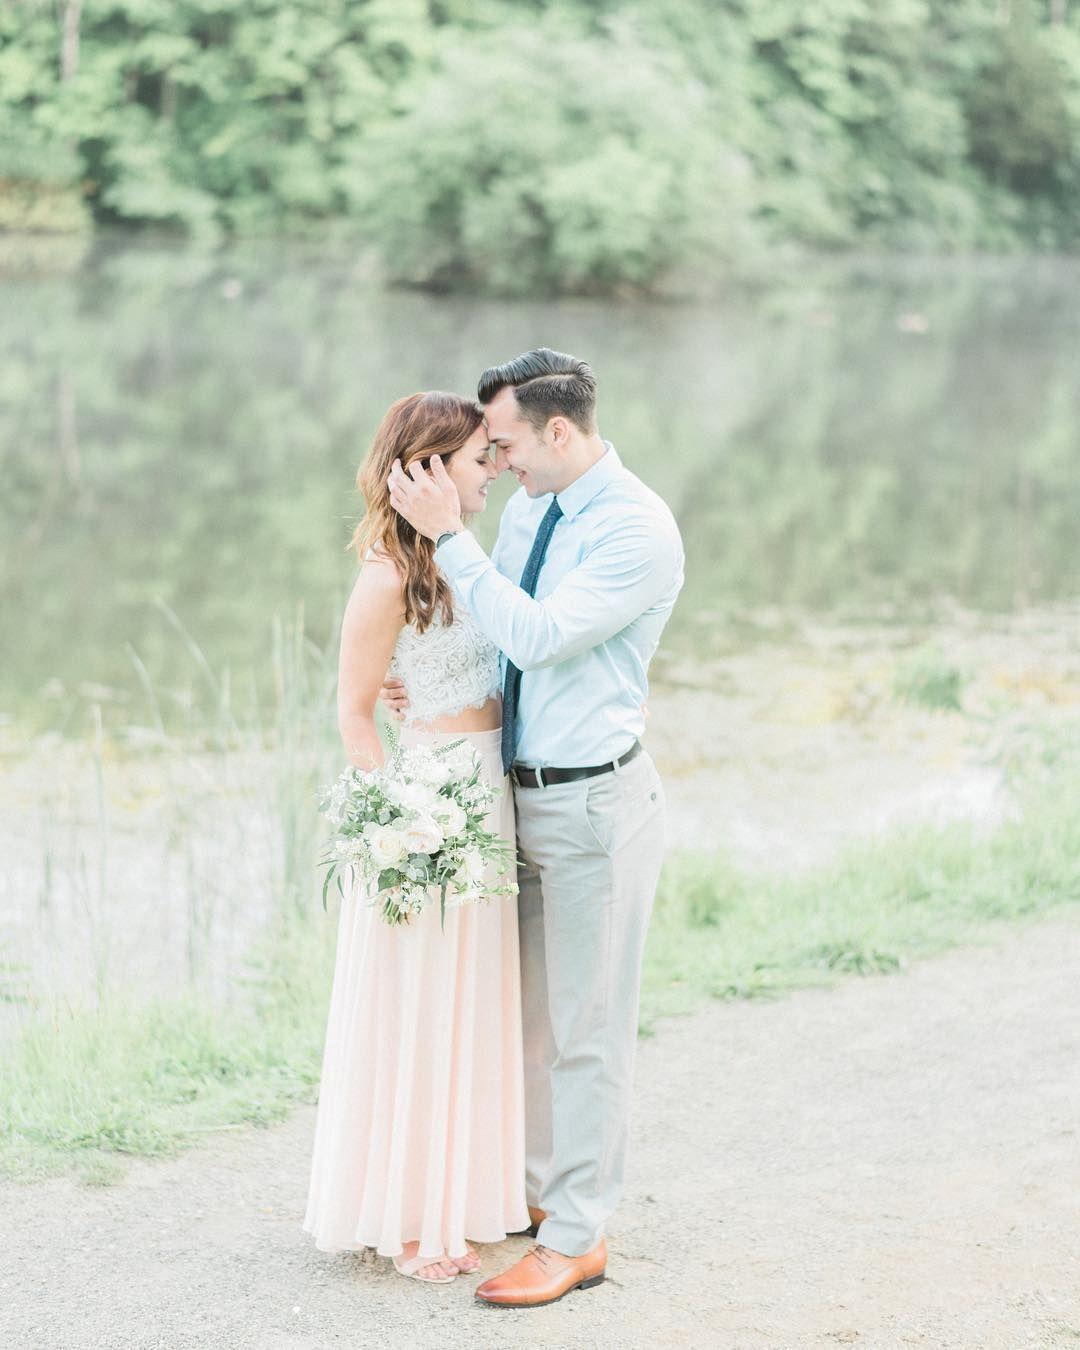 Ashleylinkphotography Wedding Engagement Pictures Spring Engagement Photos Outfits Engagement Photo Outfits [ 1350 x 1080 Pixel ]